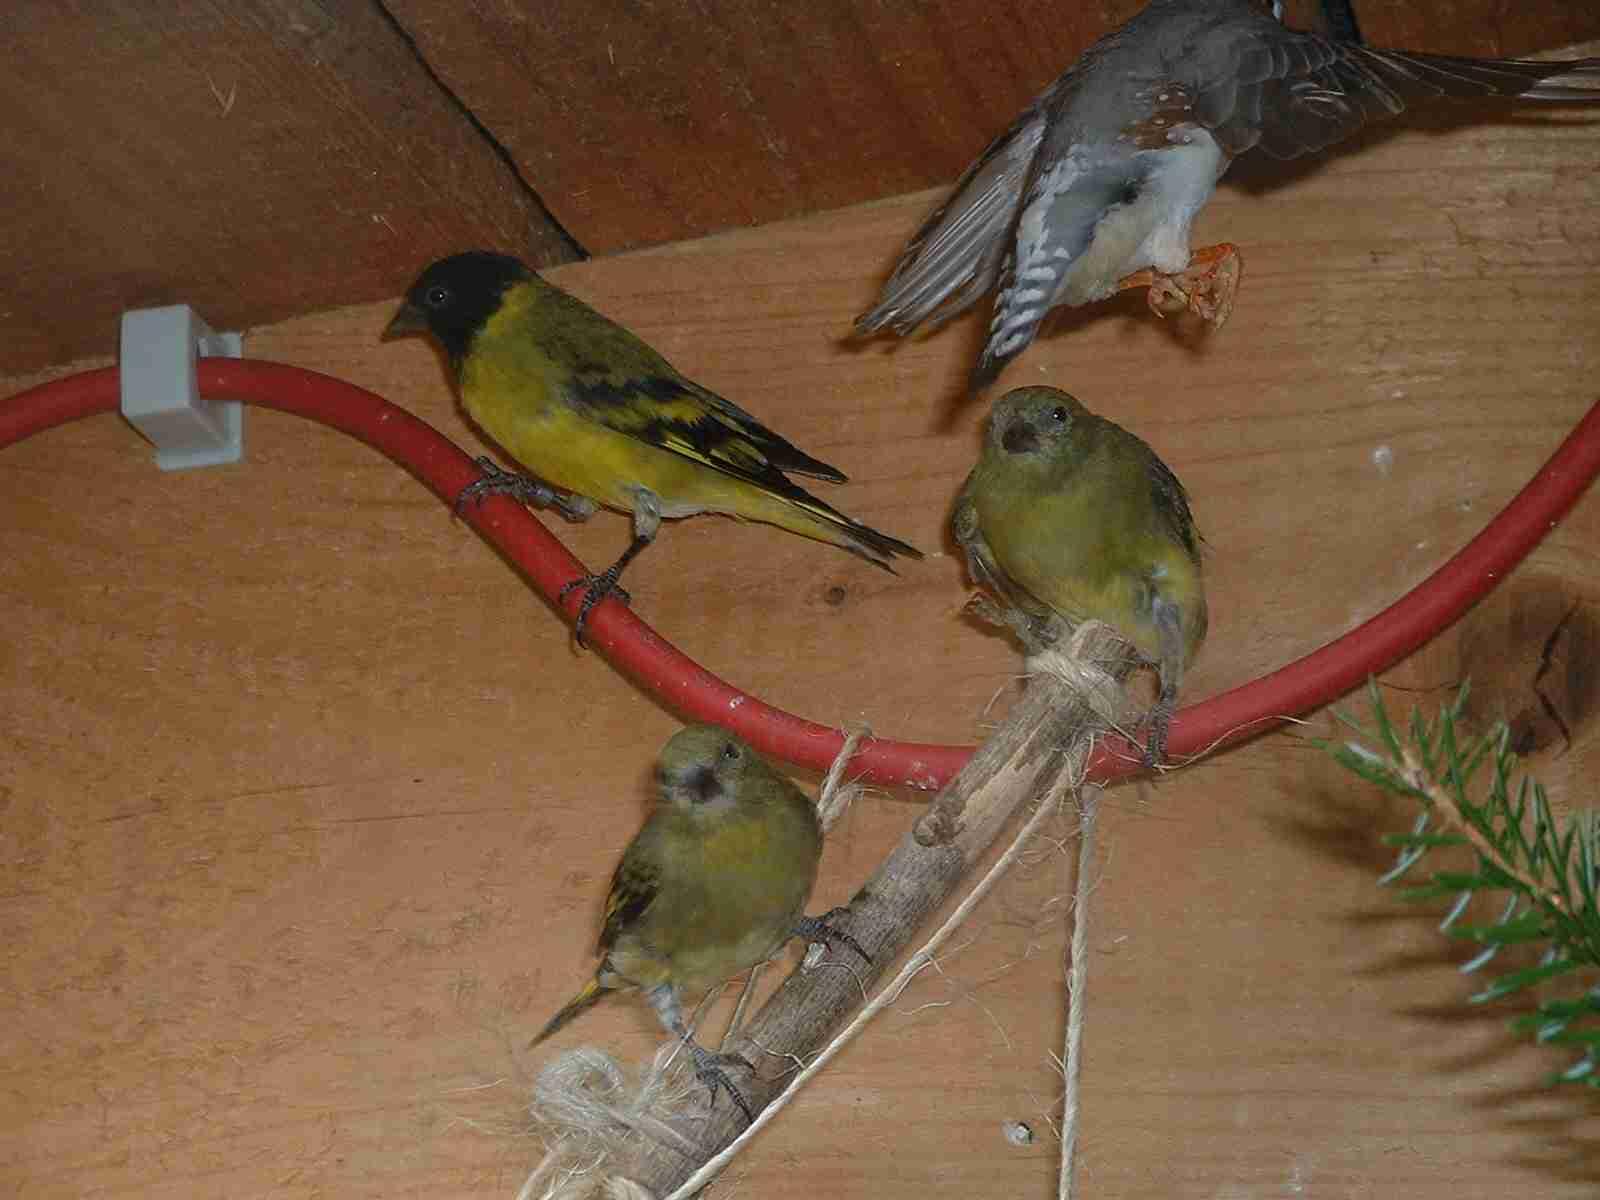 http://andysvogelzucht.klack.org/bilder/bild1931.jpg